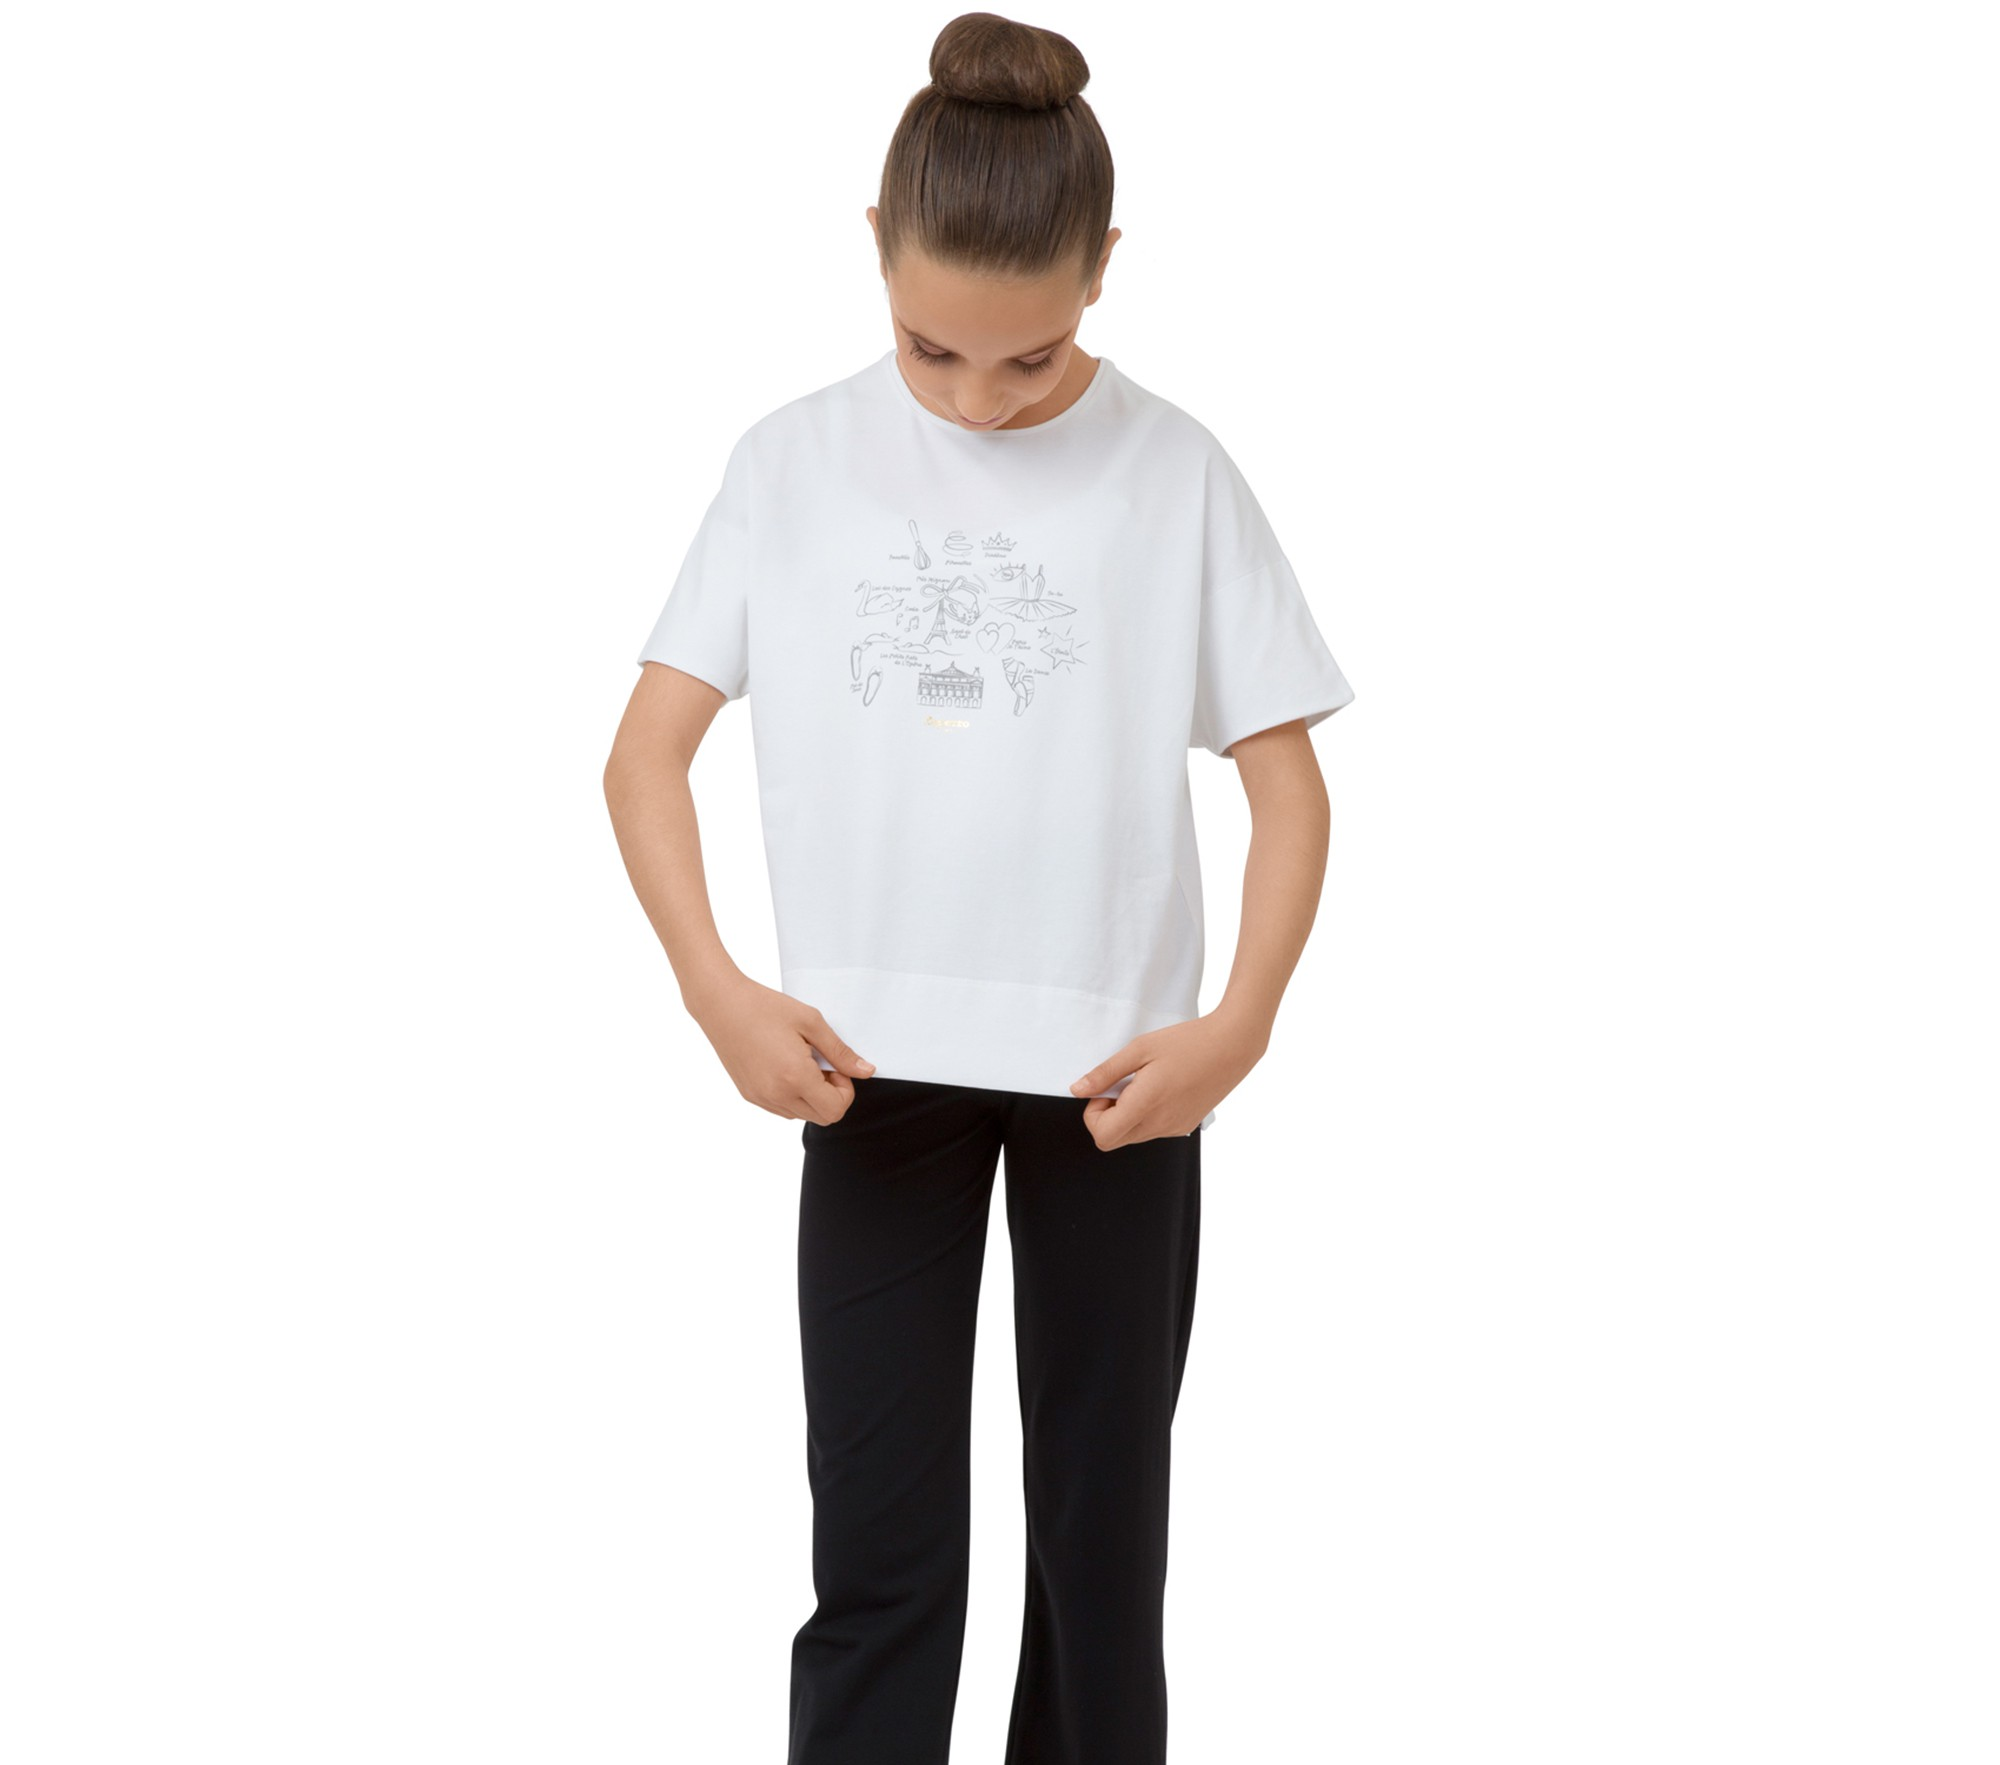 Tee shirt graphisme enfant